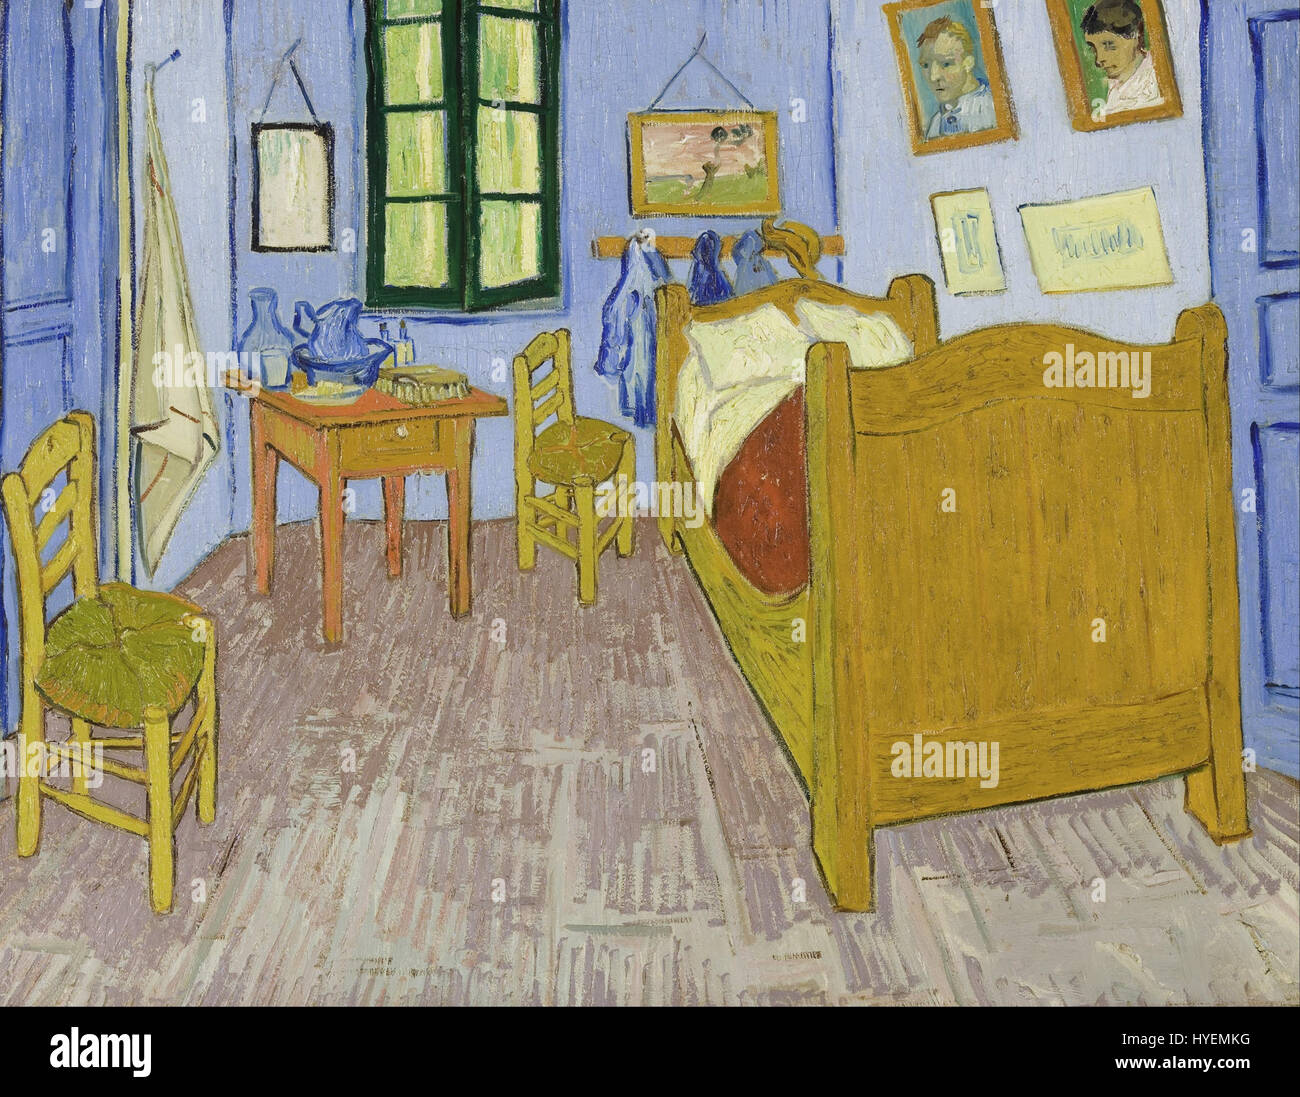 Van Goghs Bedroom At Arles Stock Photos & Van Goghs Bedroom At Arles on the starry night, wheat fields, cafe terrace at night, starry night over the rhone, bedroom in arles high resolution, bedroom at arles by van gogh, self-portraits by vincent van gogh, olive trees, yellow house, van gogh museum, room in arles van gogh, bedroom vincent van gogh ppt, the church at auvers, vincent van gogh, room at arles van gogh, sunday afternoon on the island of la grande jatte, bedroom in arles 1889, the bedroom van gogh, church at arles van gogh, portrait of dr. gachet, bedroom van gogh painting oil, the potato eaters, water lilies, sesame street bedroom van gogh, wheat field with crows,